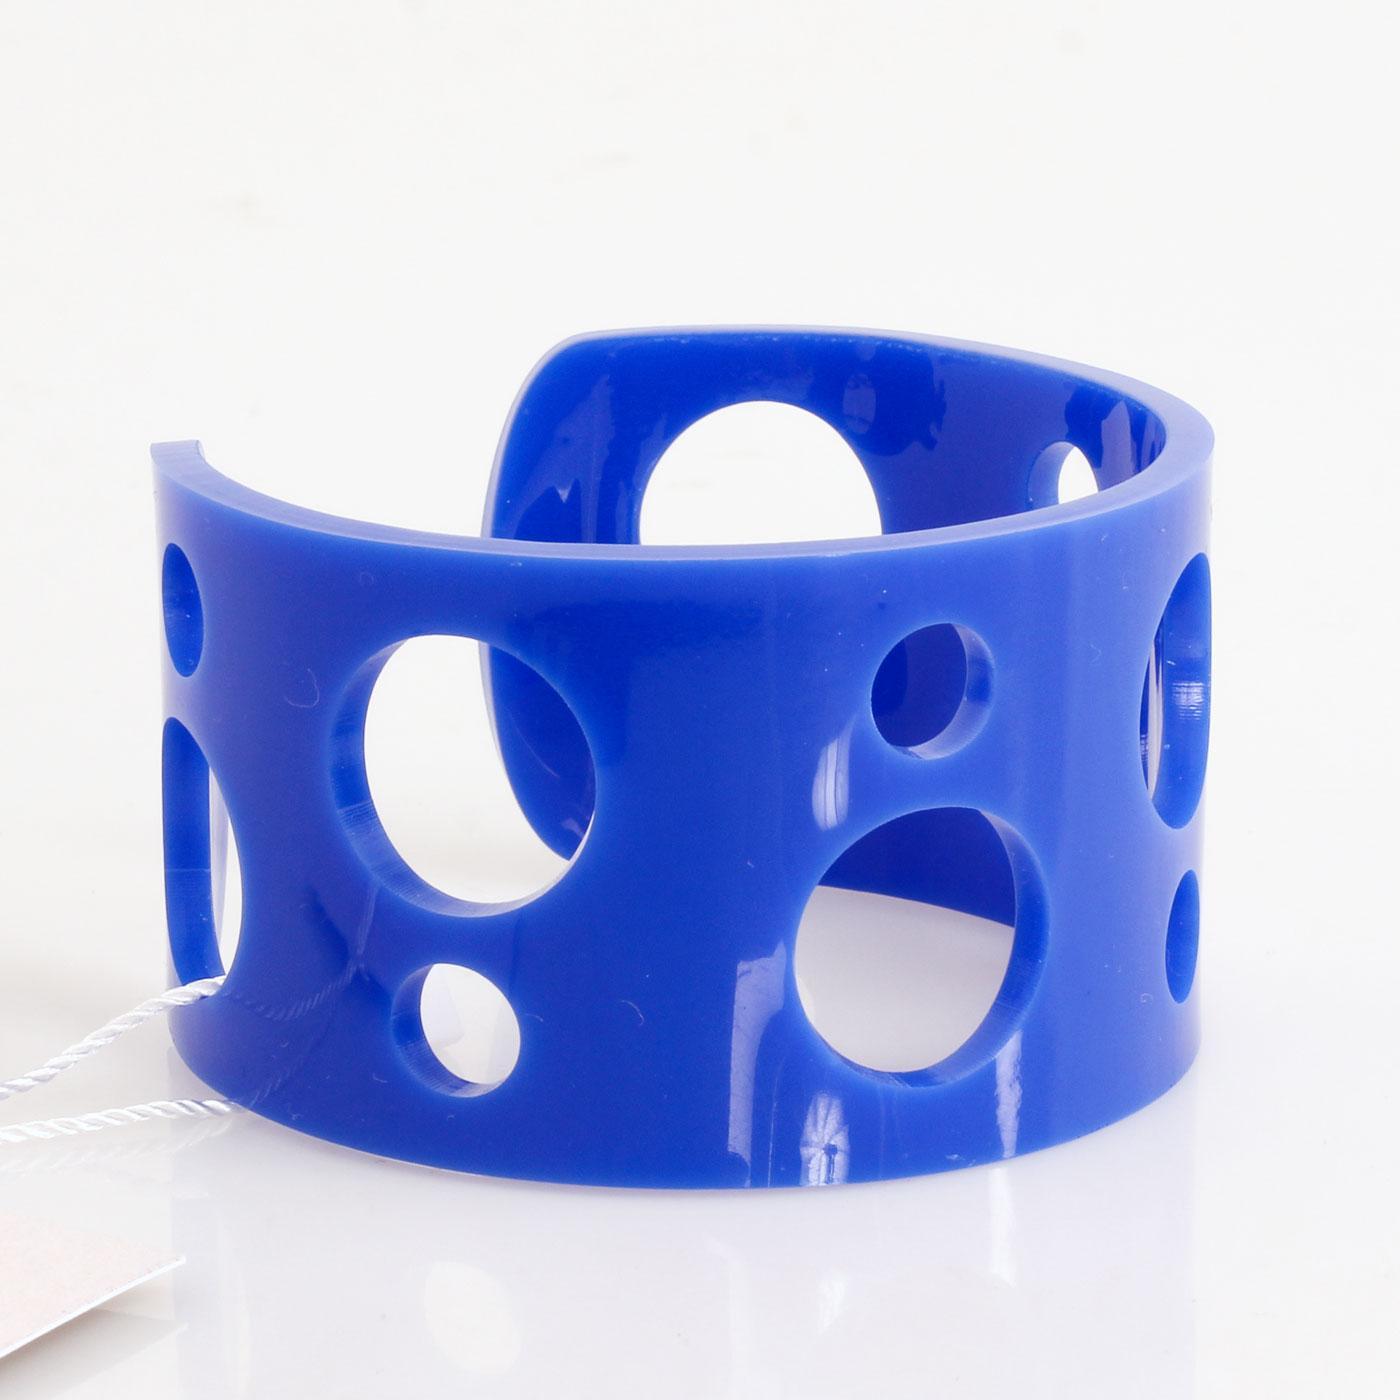 ADA BINKS for MADCAP ENGLAND 60s Cuff Bracelet